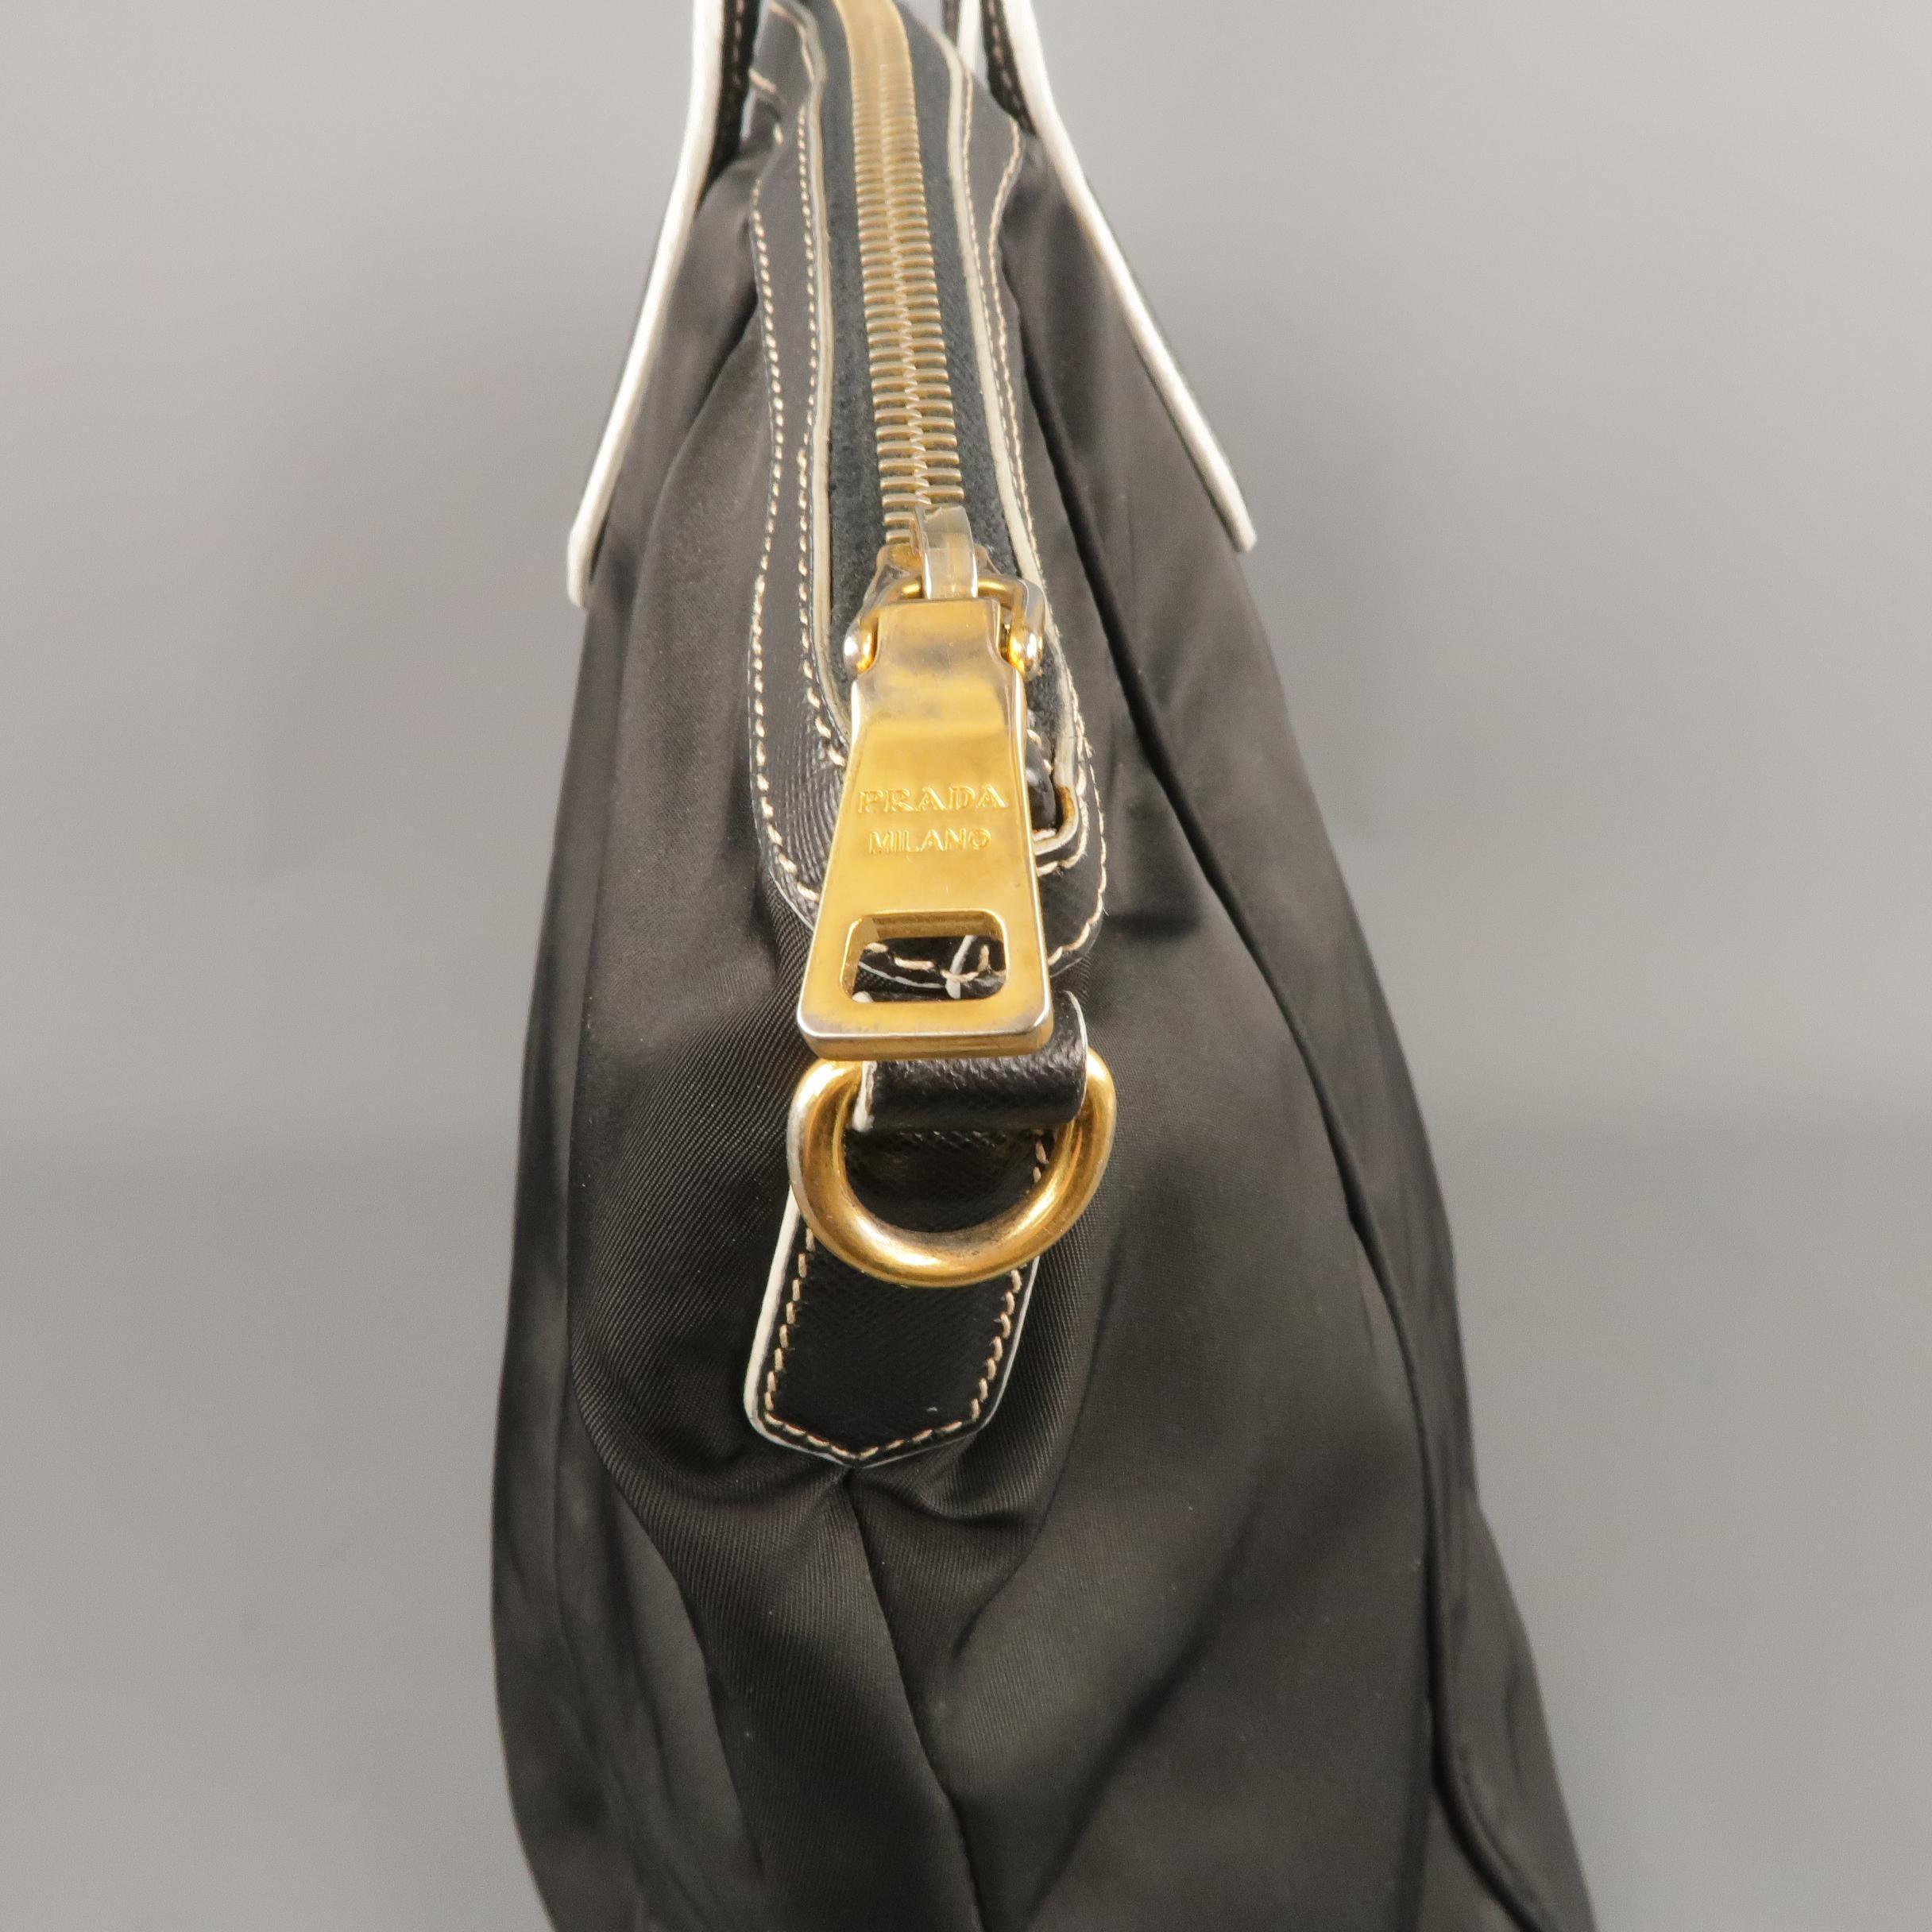 71409ef5b0 PRADA Black Nylon and Leather Tote Handbag at 1stdibs